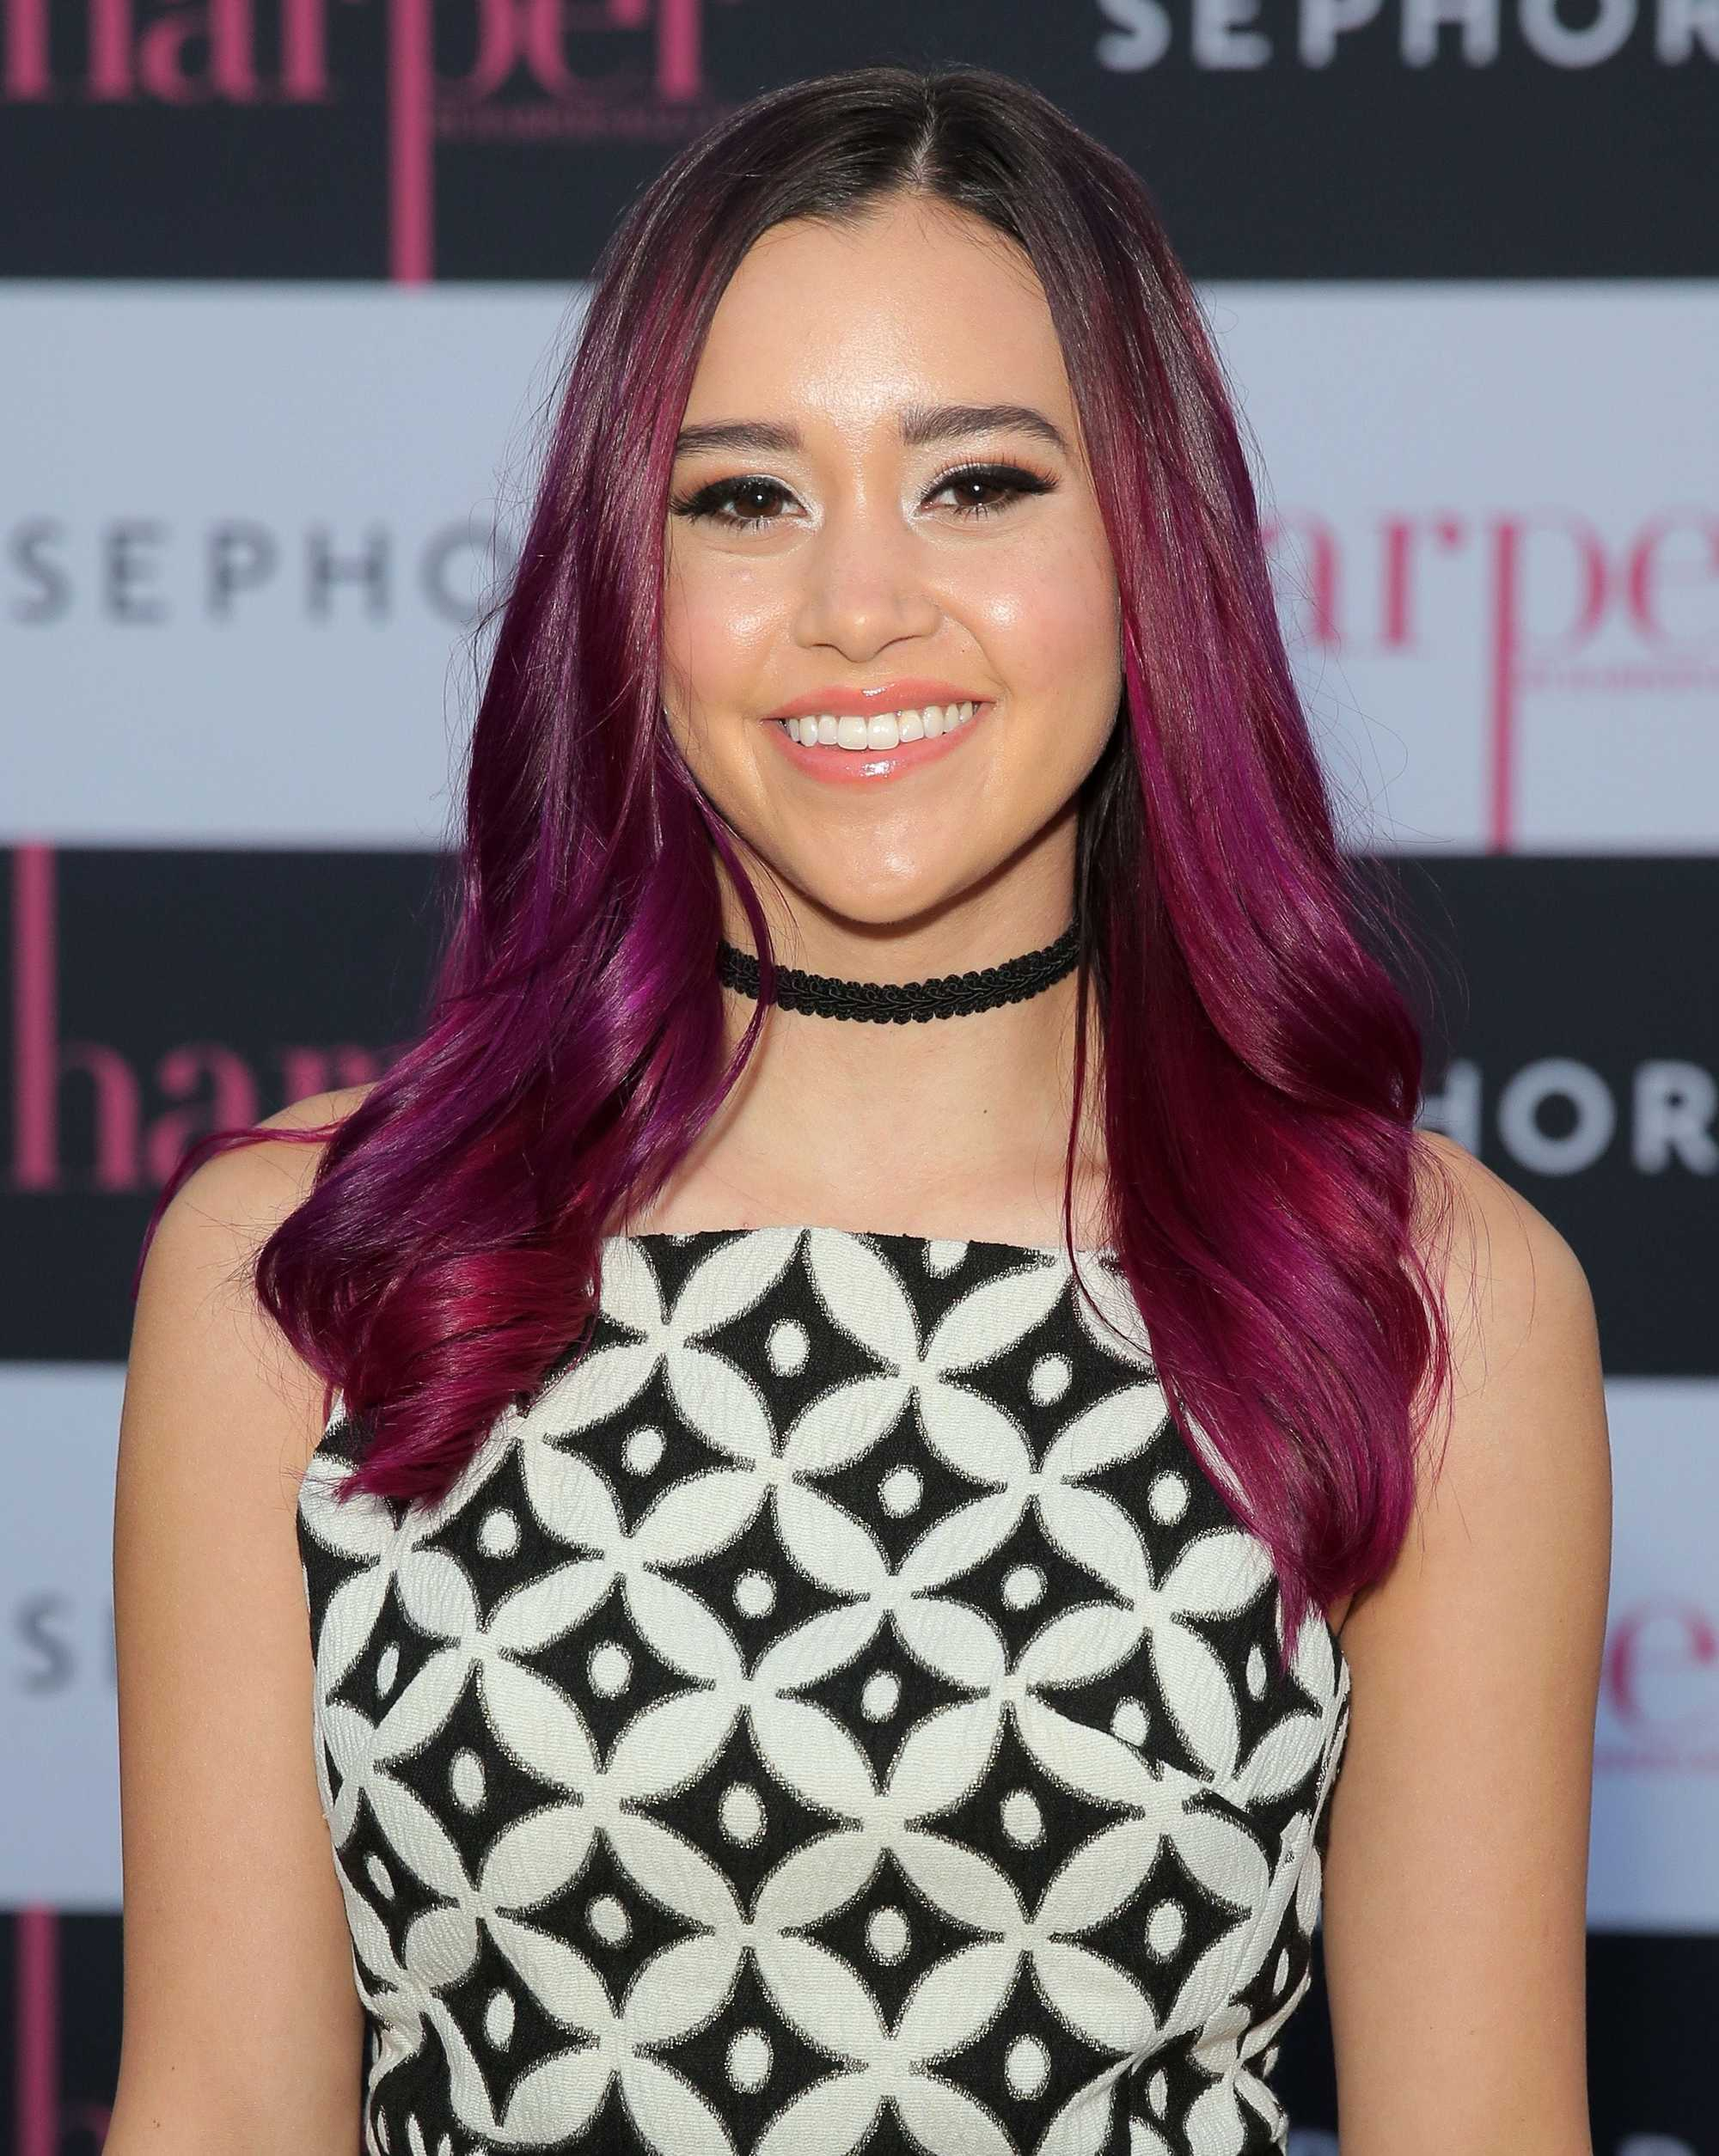 megan nicole with dark purple hair on the red carpet